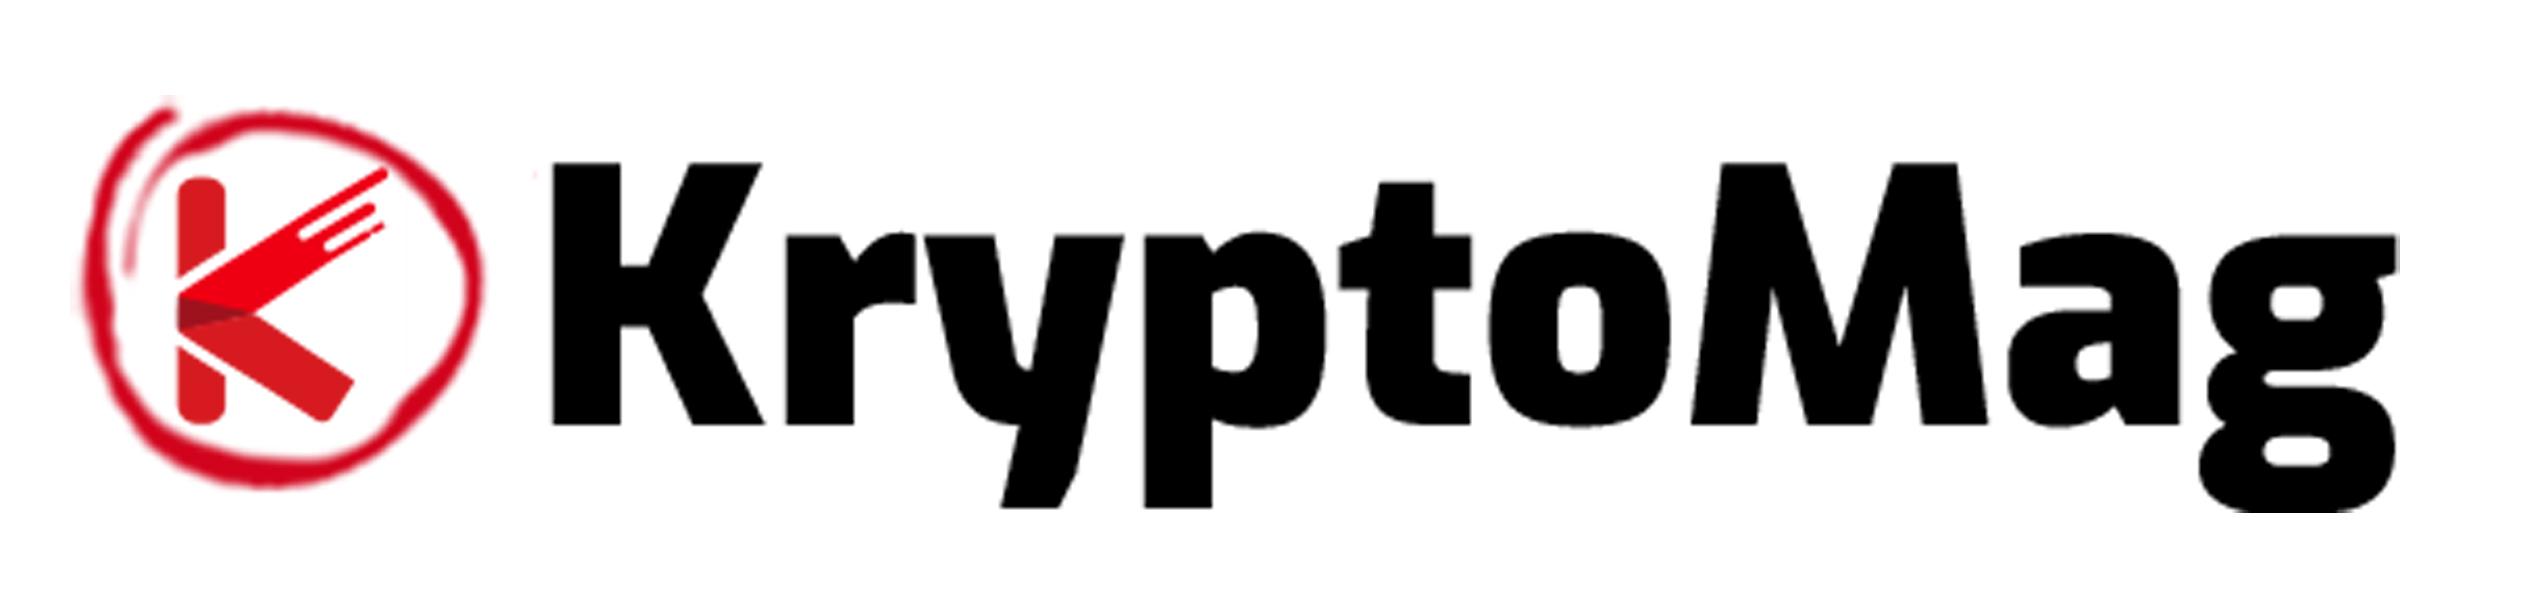 Kryptomag – rankingi giełd kryptowalut i portfeli